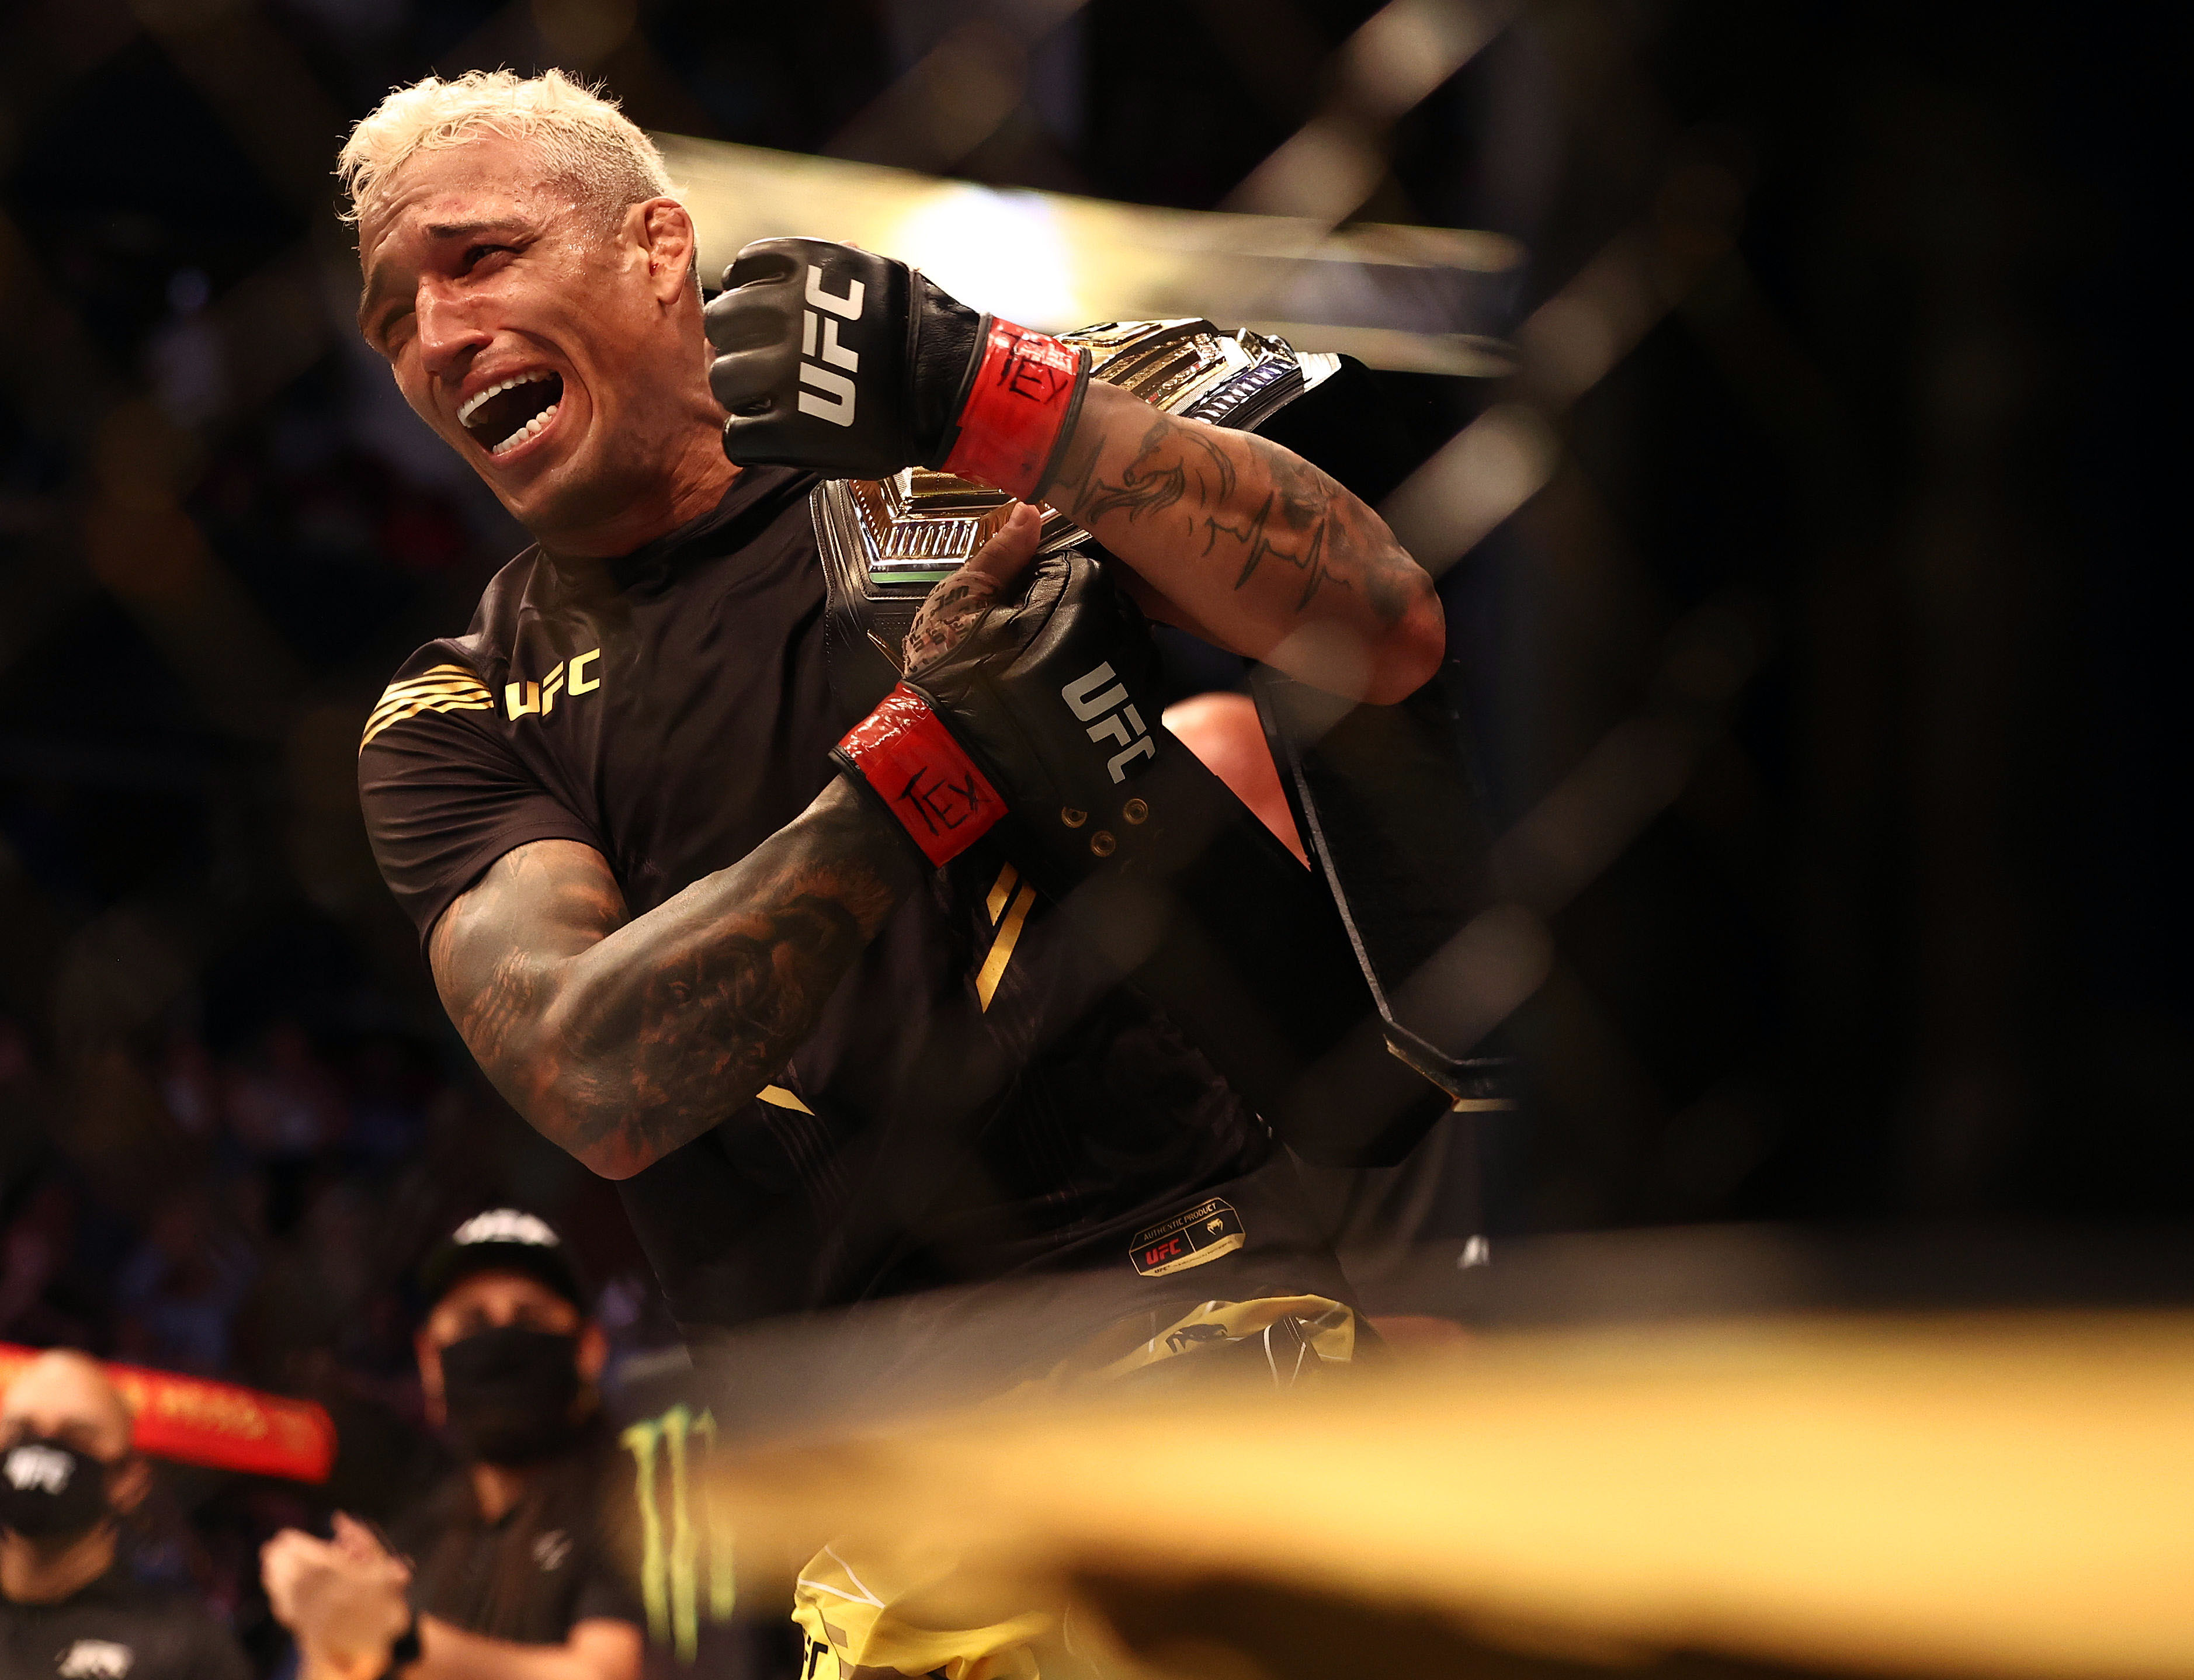 爱游戏app下载的游戏不能玩MMA:UFC 262-Oliveira VS Chandler